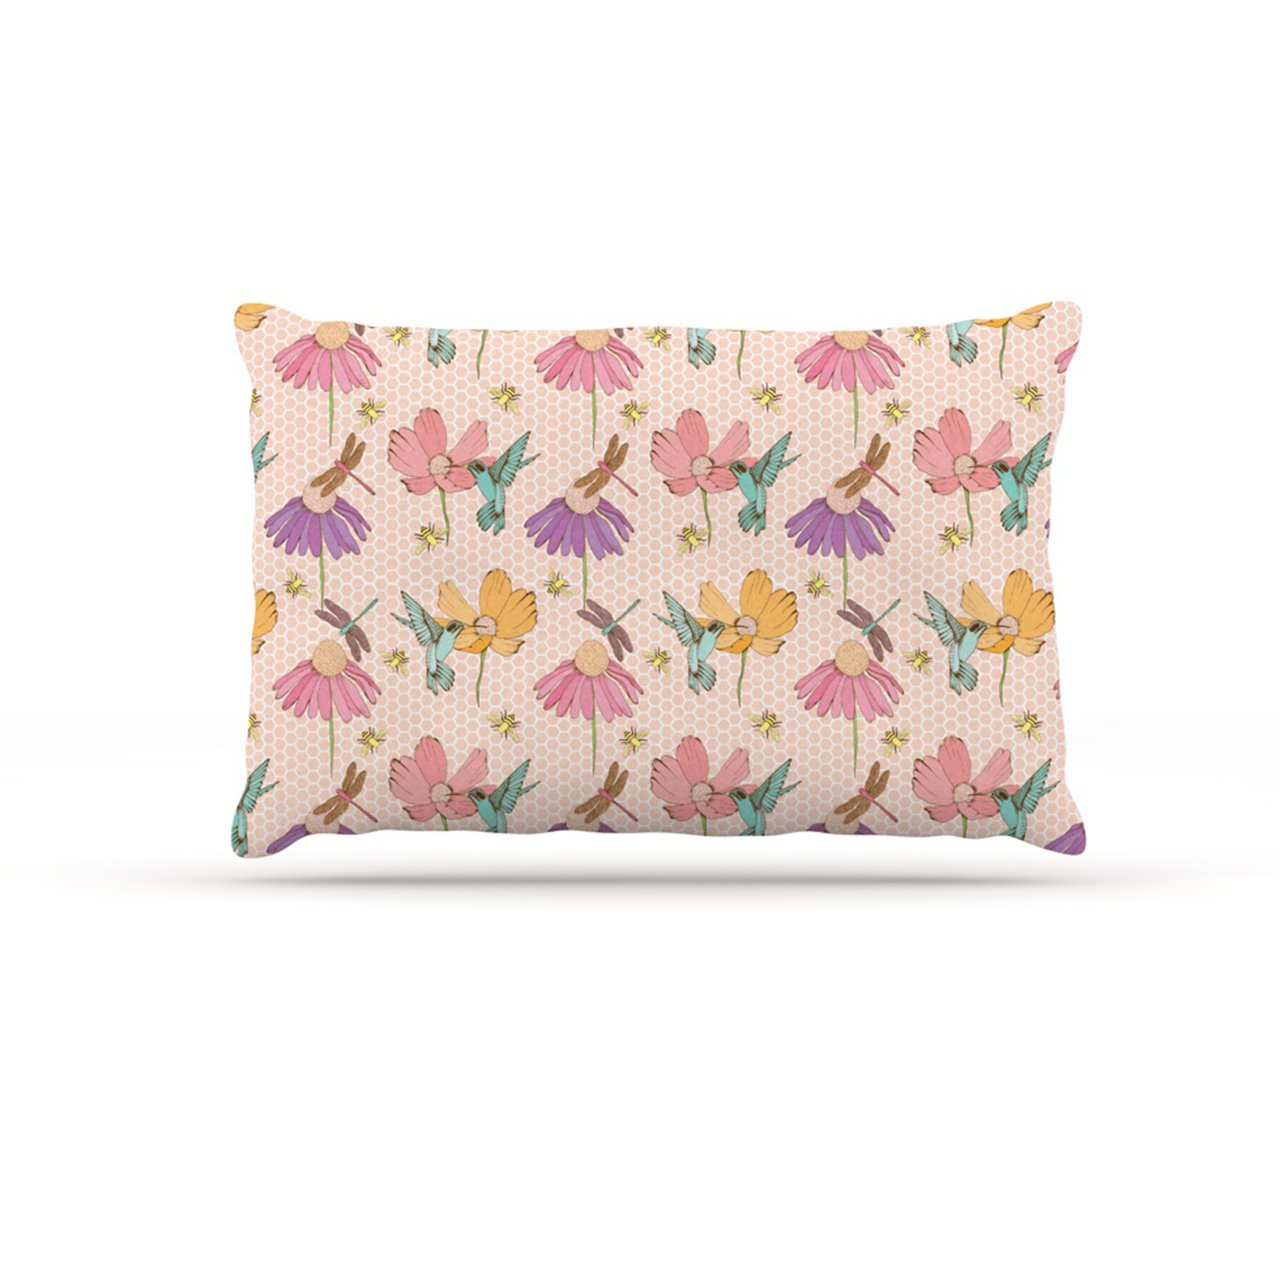 Large 30\ Kess InHouse Laura Escalante Magic Garden  Fleece Dog Bed, 30 by 40-Inch